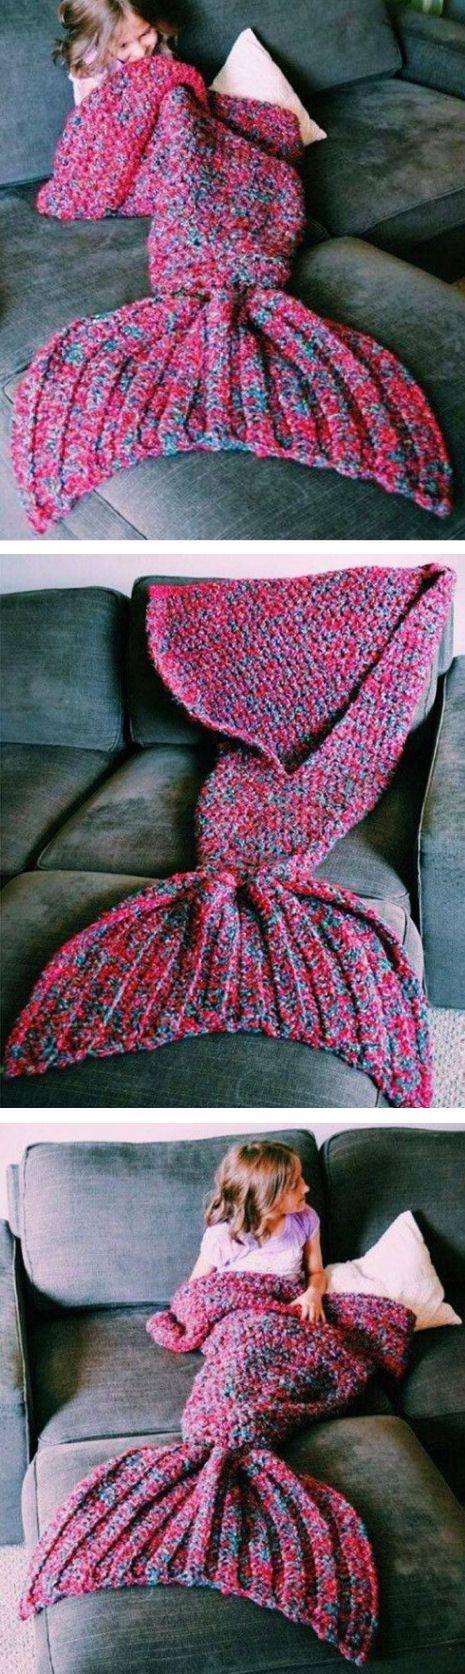 OMG .. Comfy & cUte! Mermaid Tail Blanket ❤ #want | Arts & Crafts ...